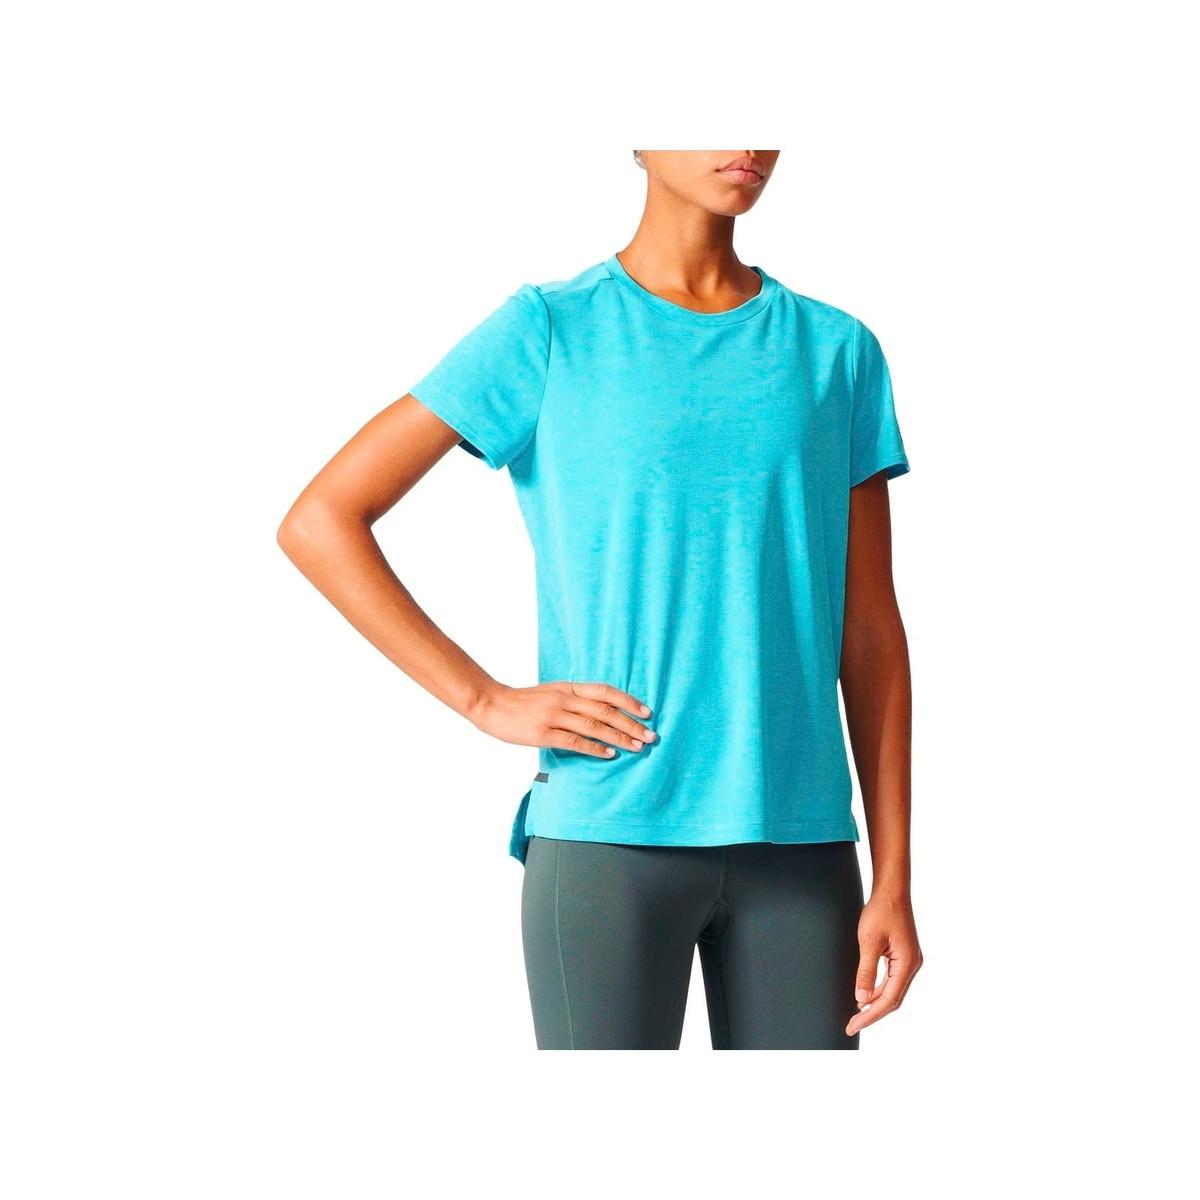 Damen adidas Core Chill Tee Shirt